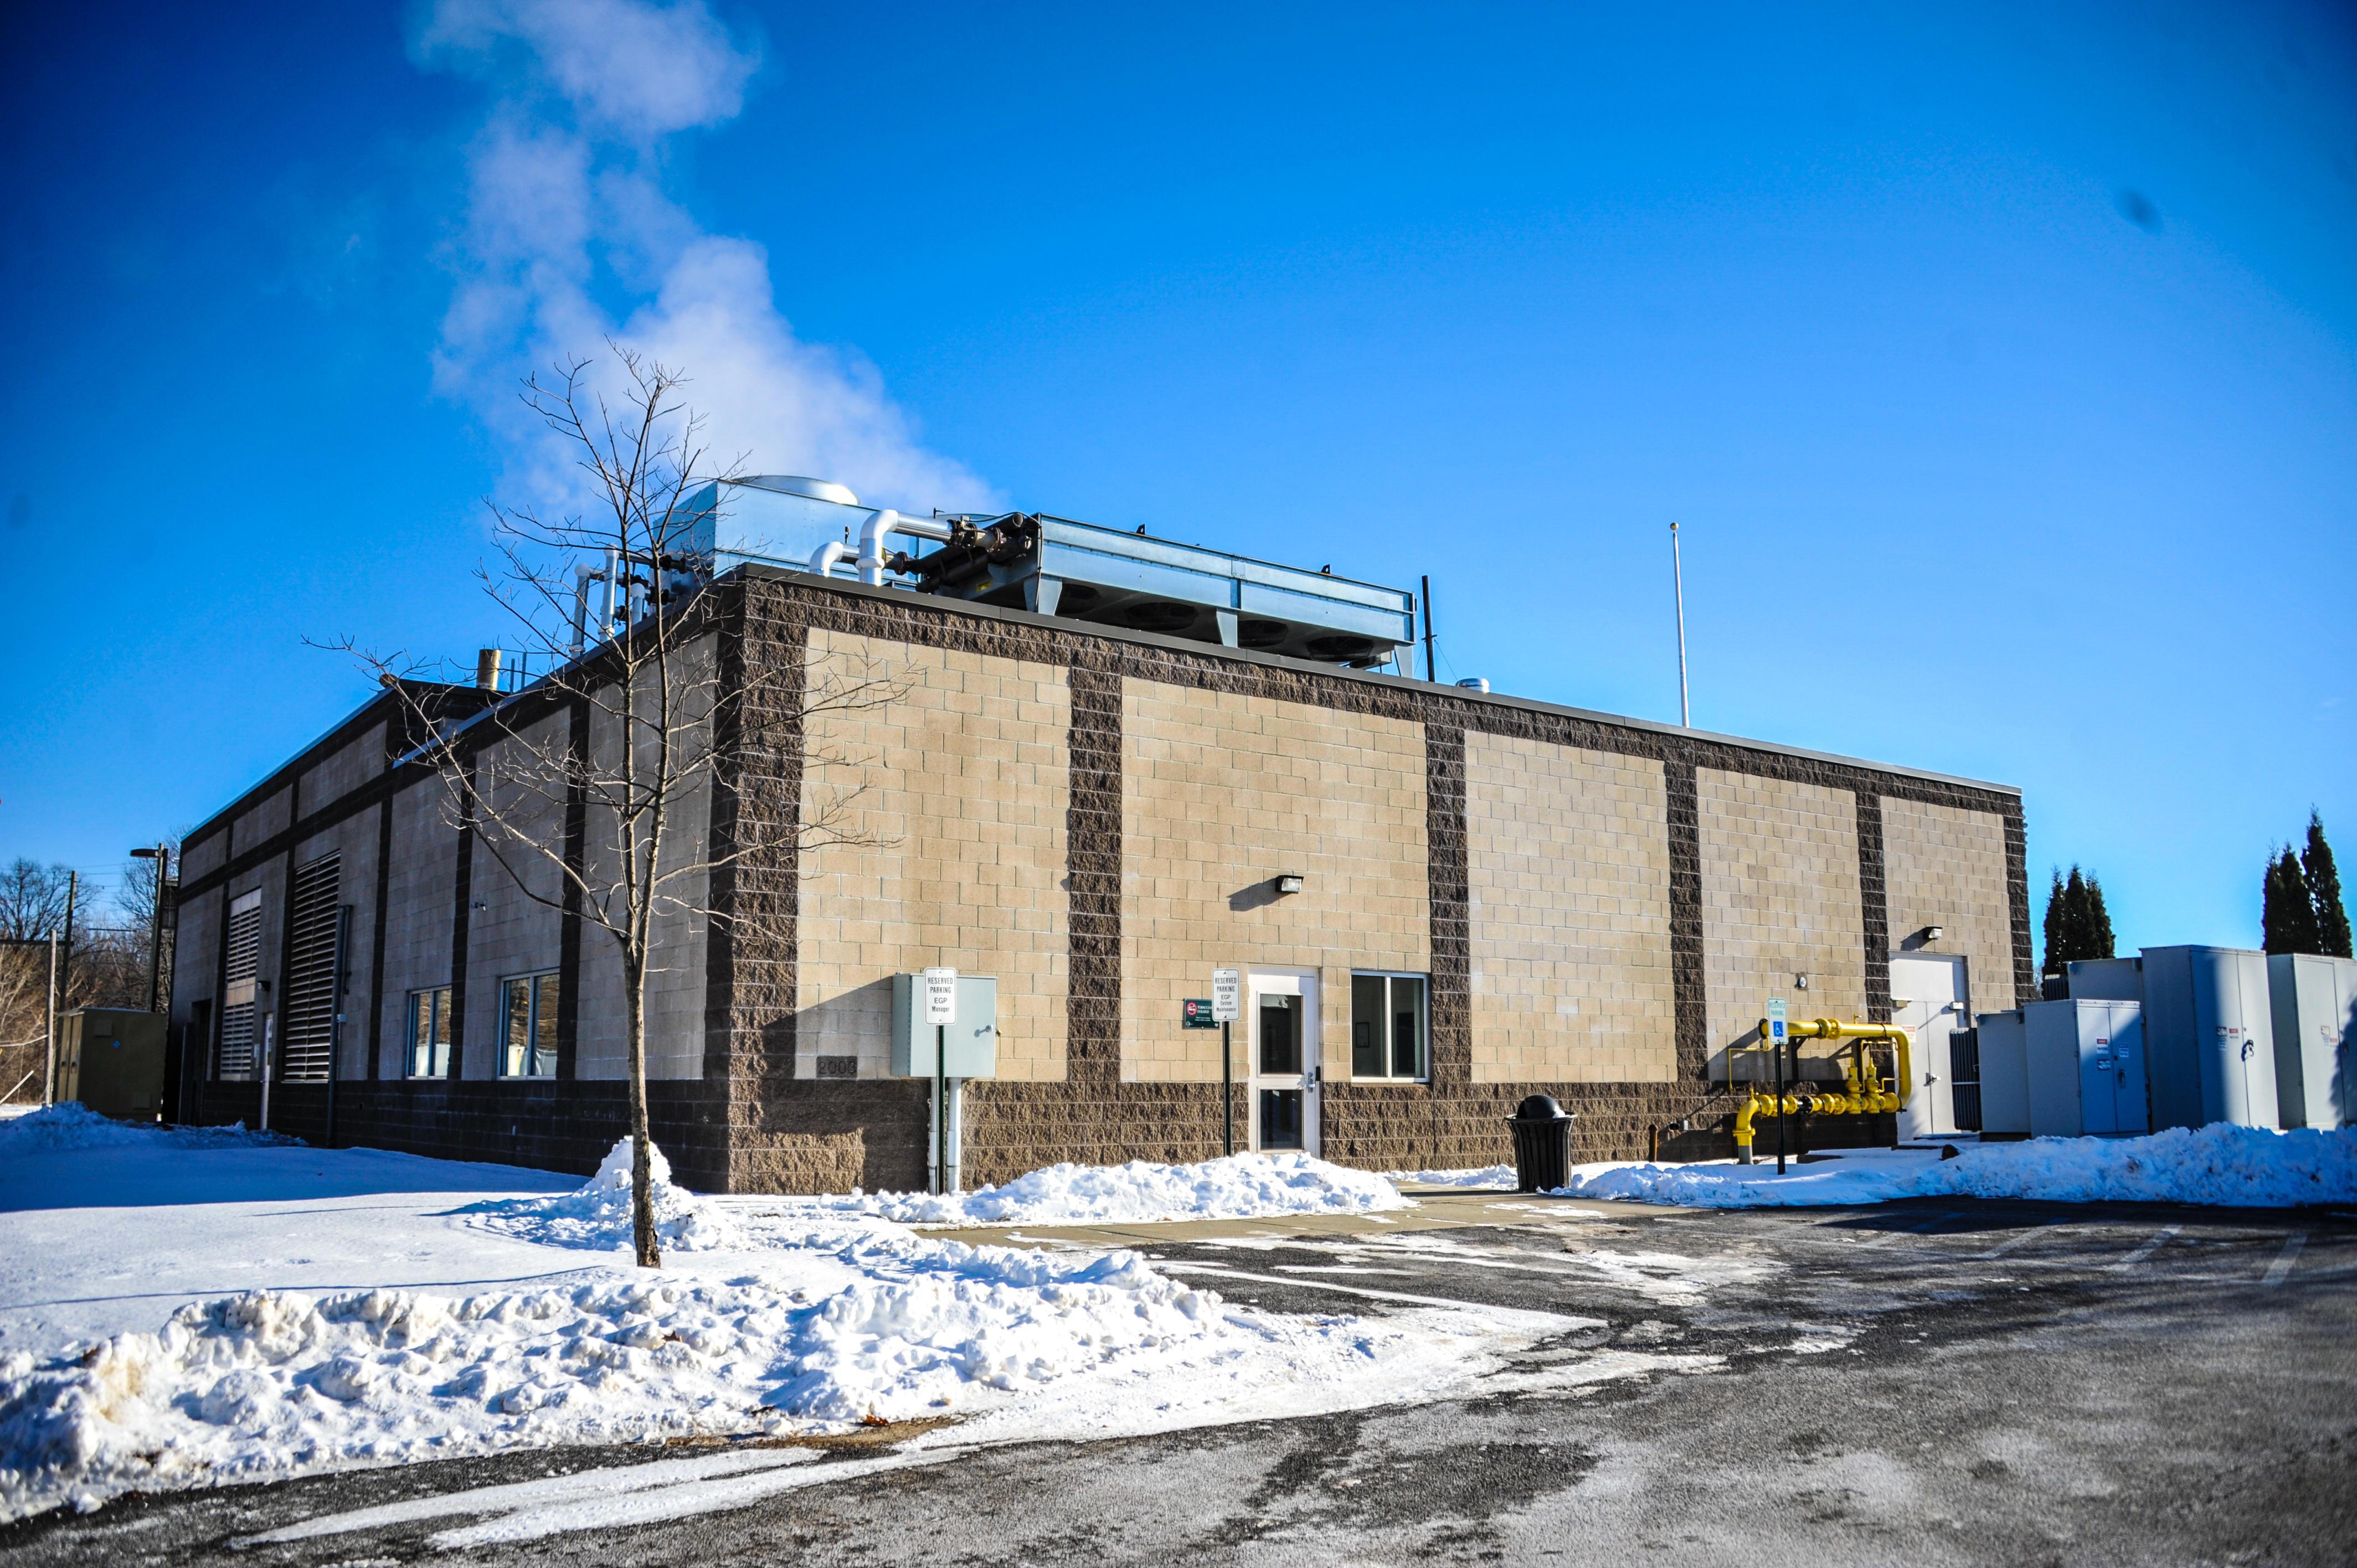 The power generator behind Joe Bruno stadium has been in use since 2003.